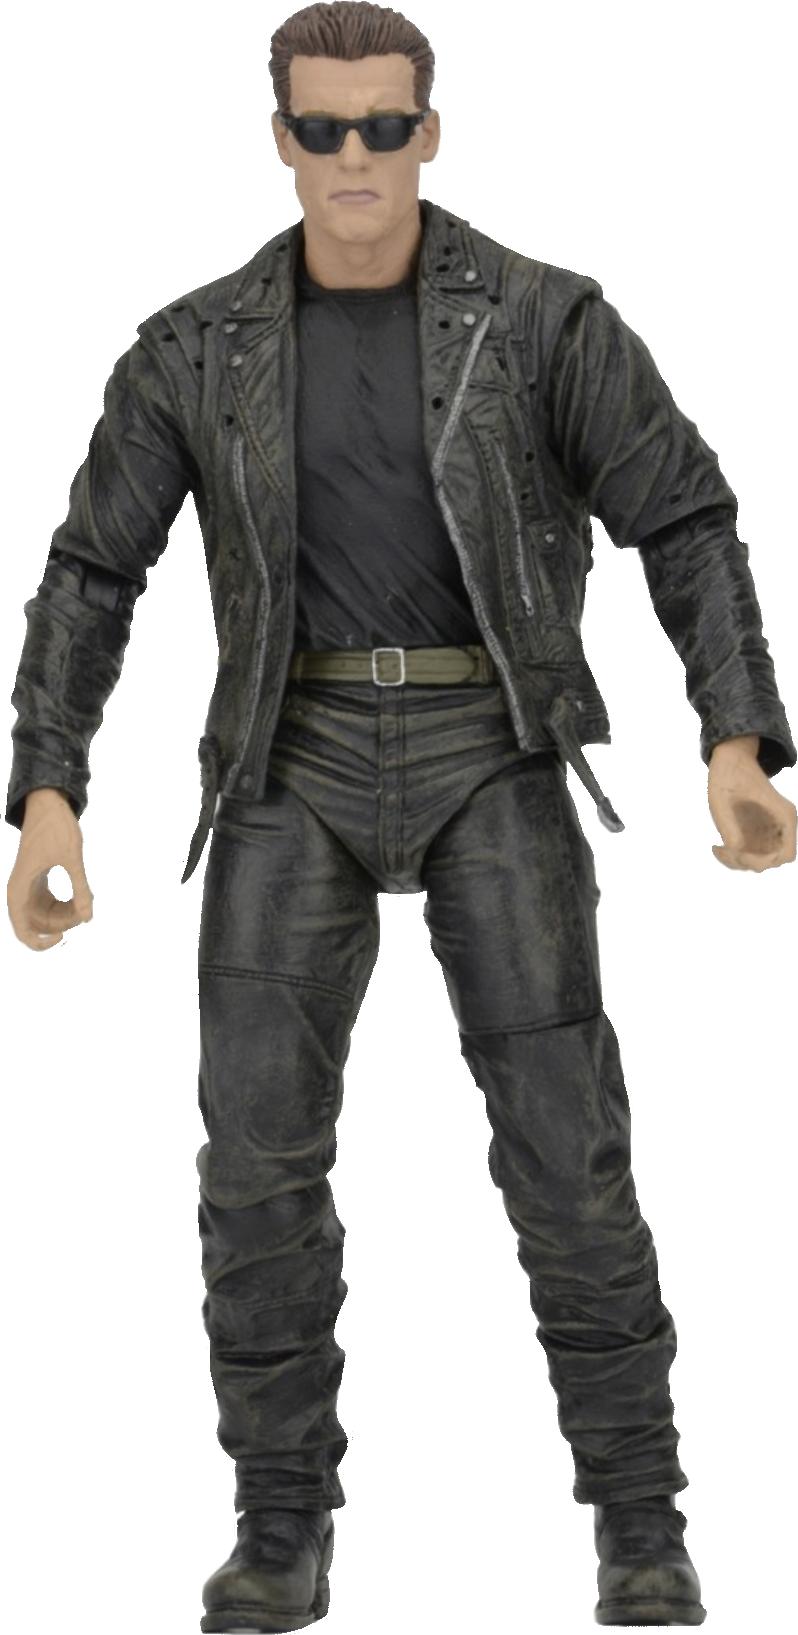 TerminatorArnold Schwarzenegger PNG Image